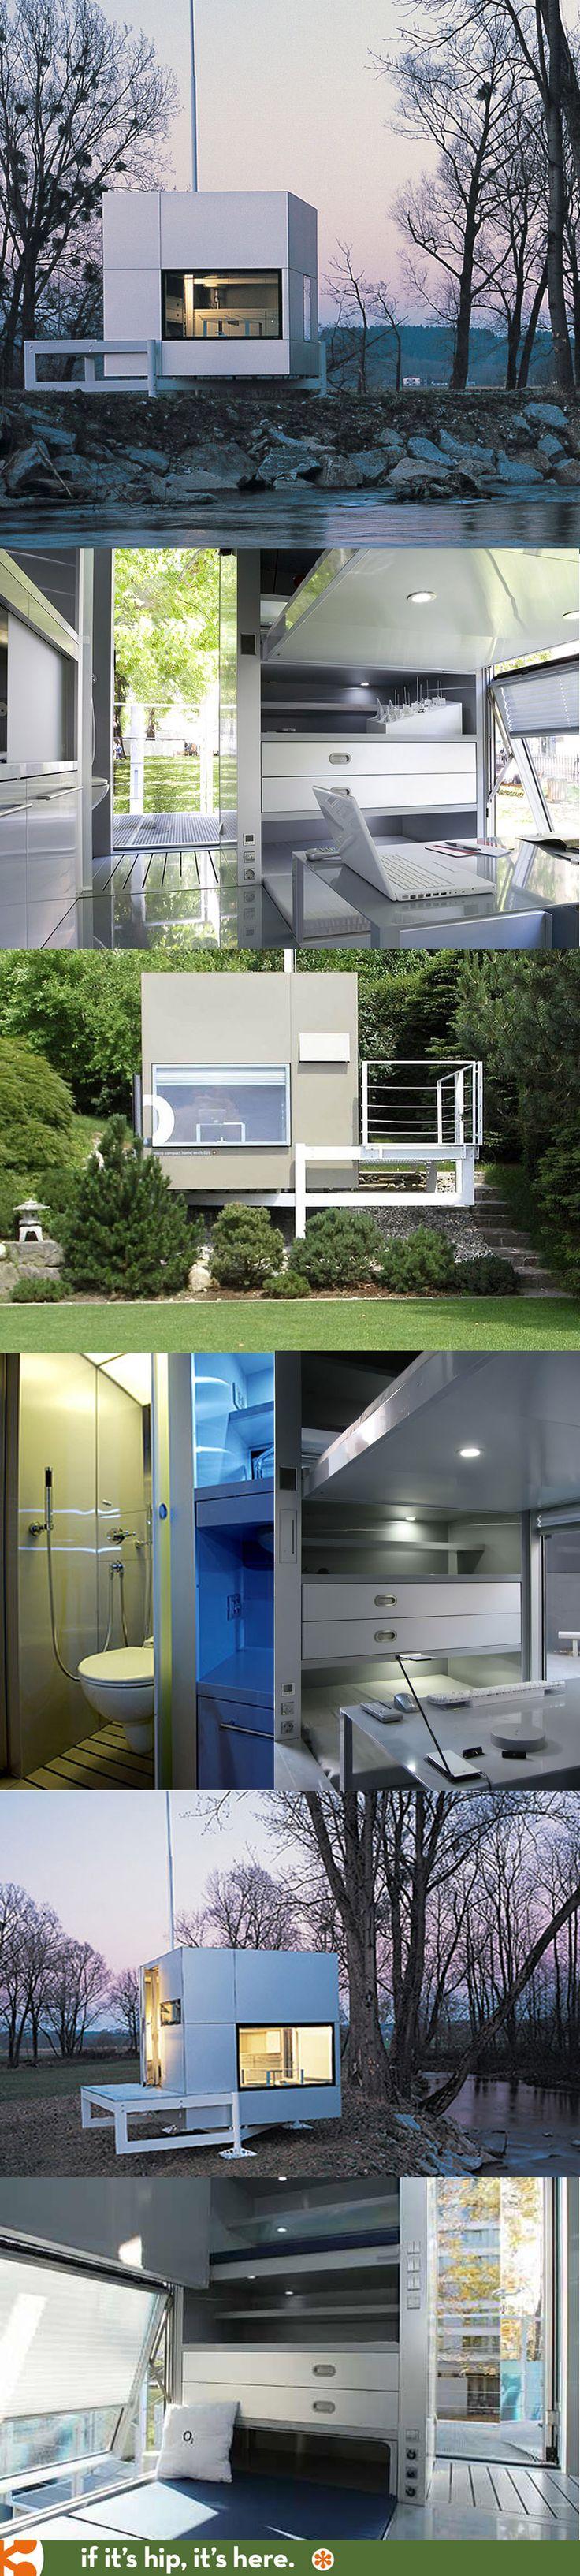 M-ch micro home